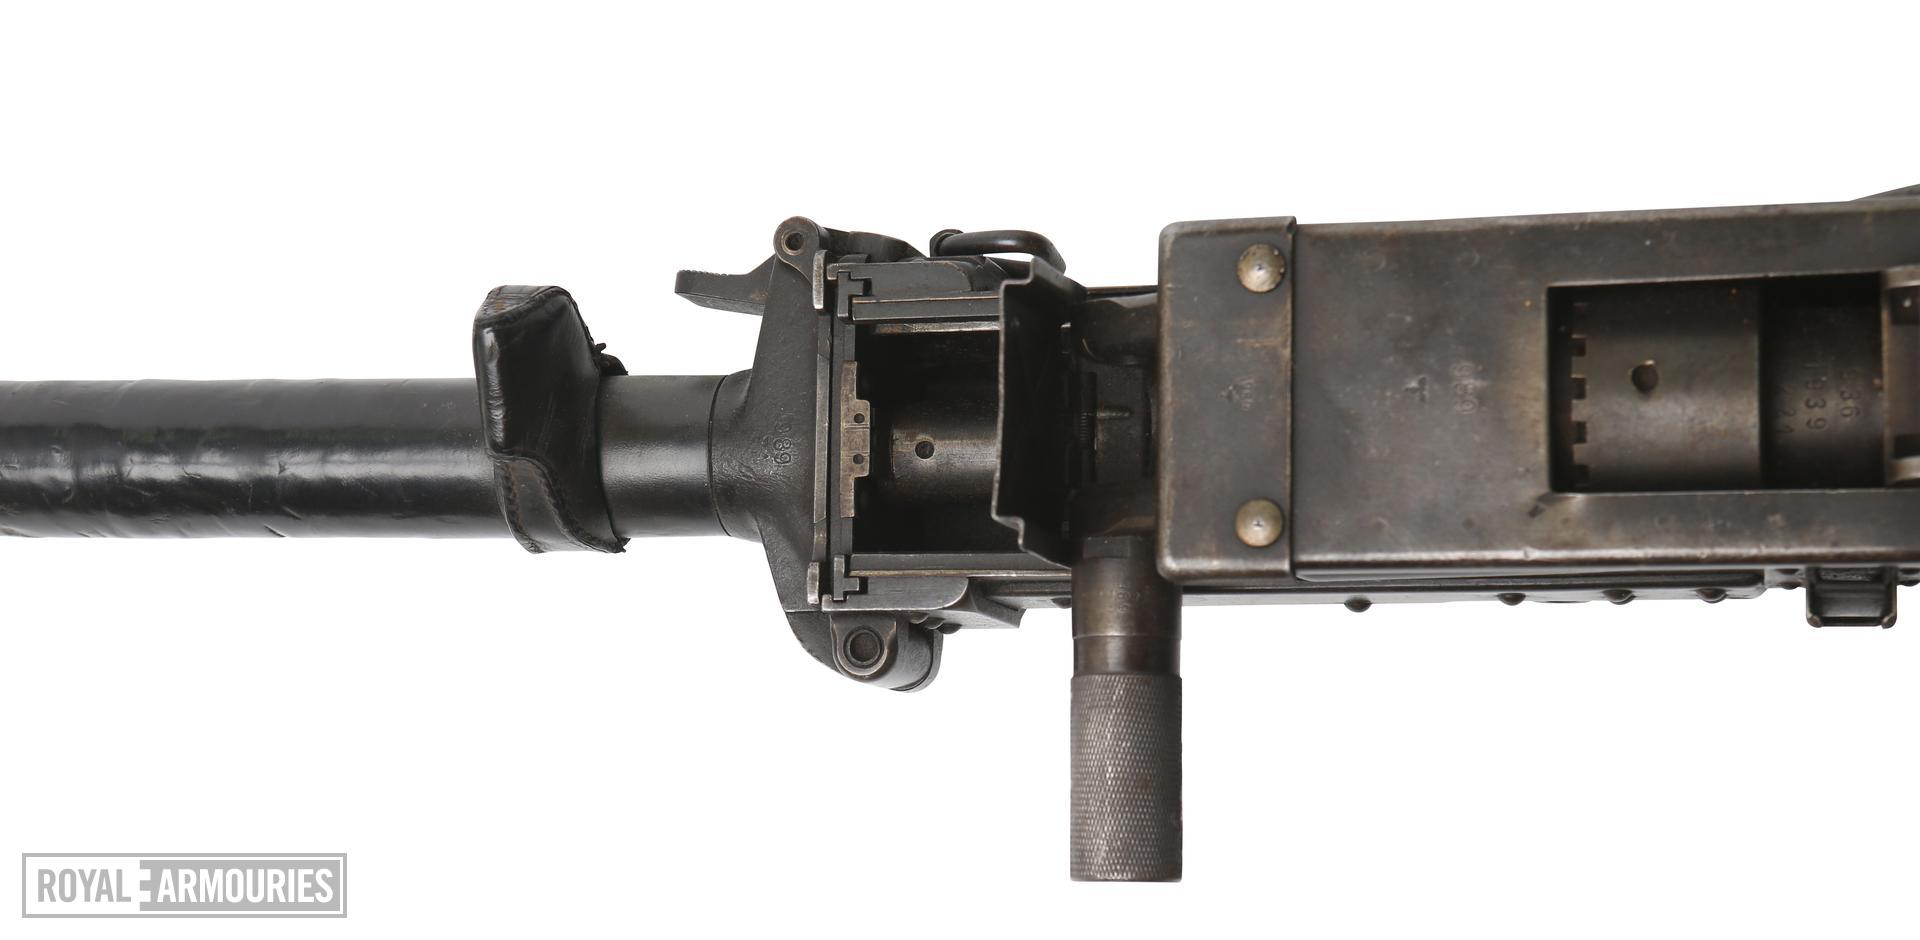 Centrefire bolt-action anti-tank rifle - Godsal